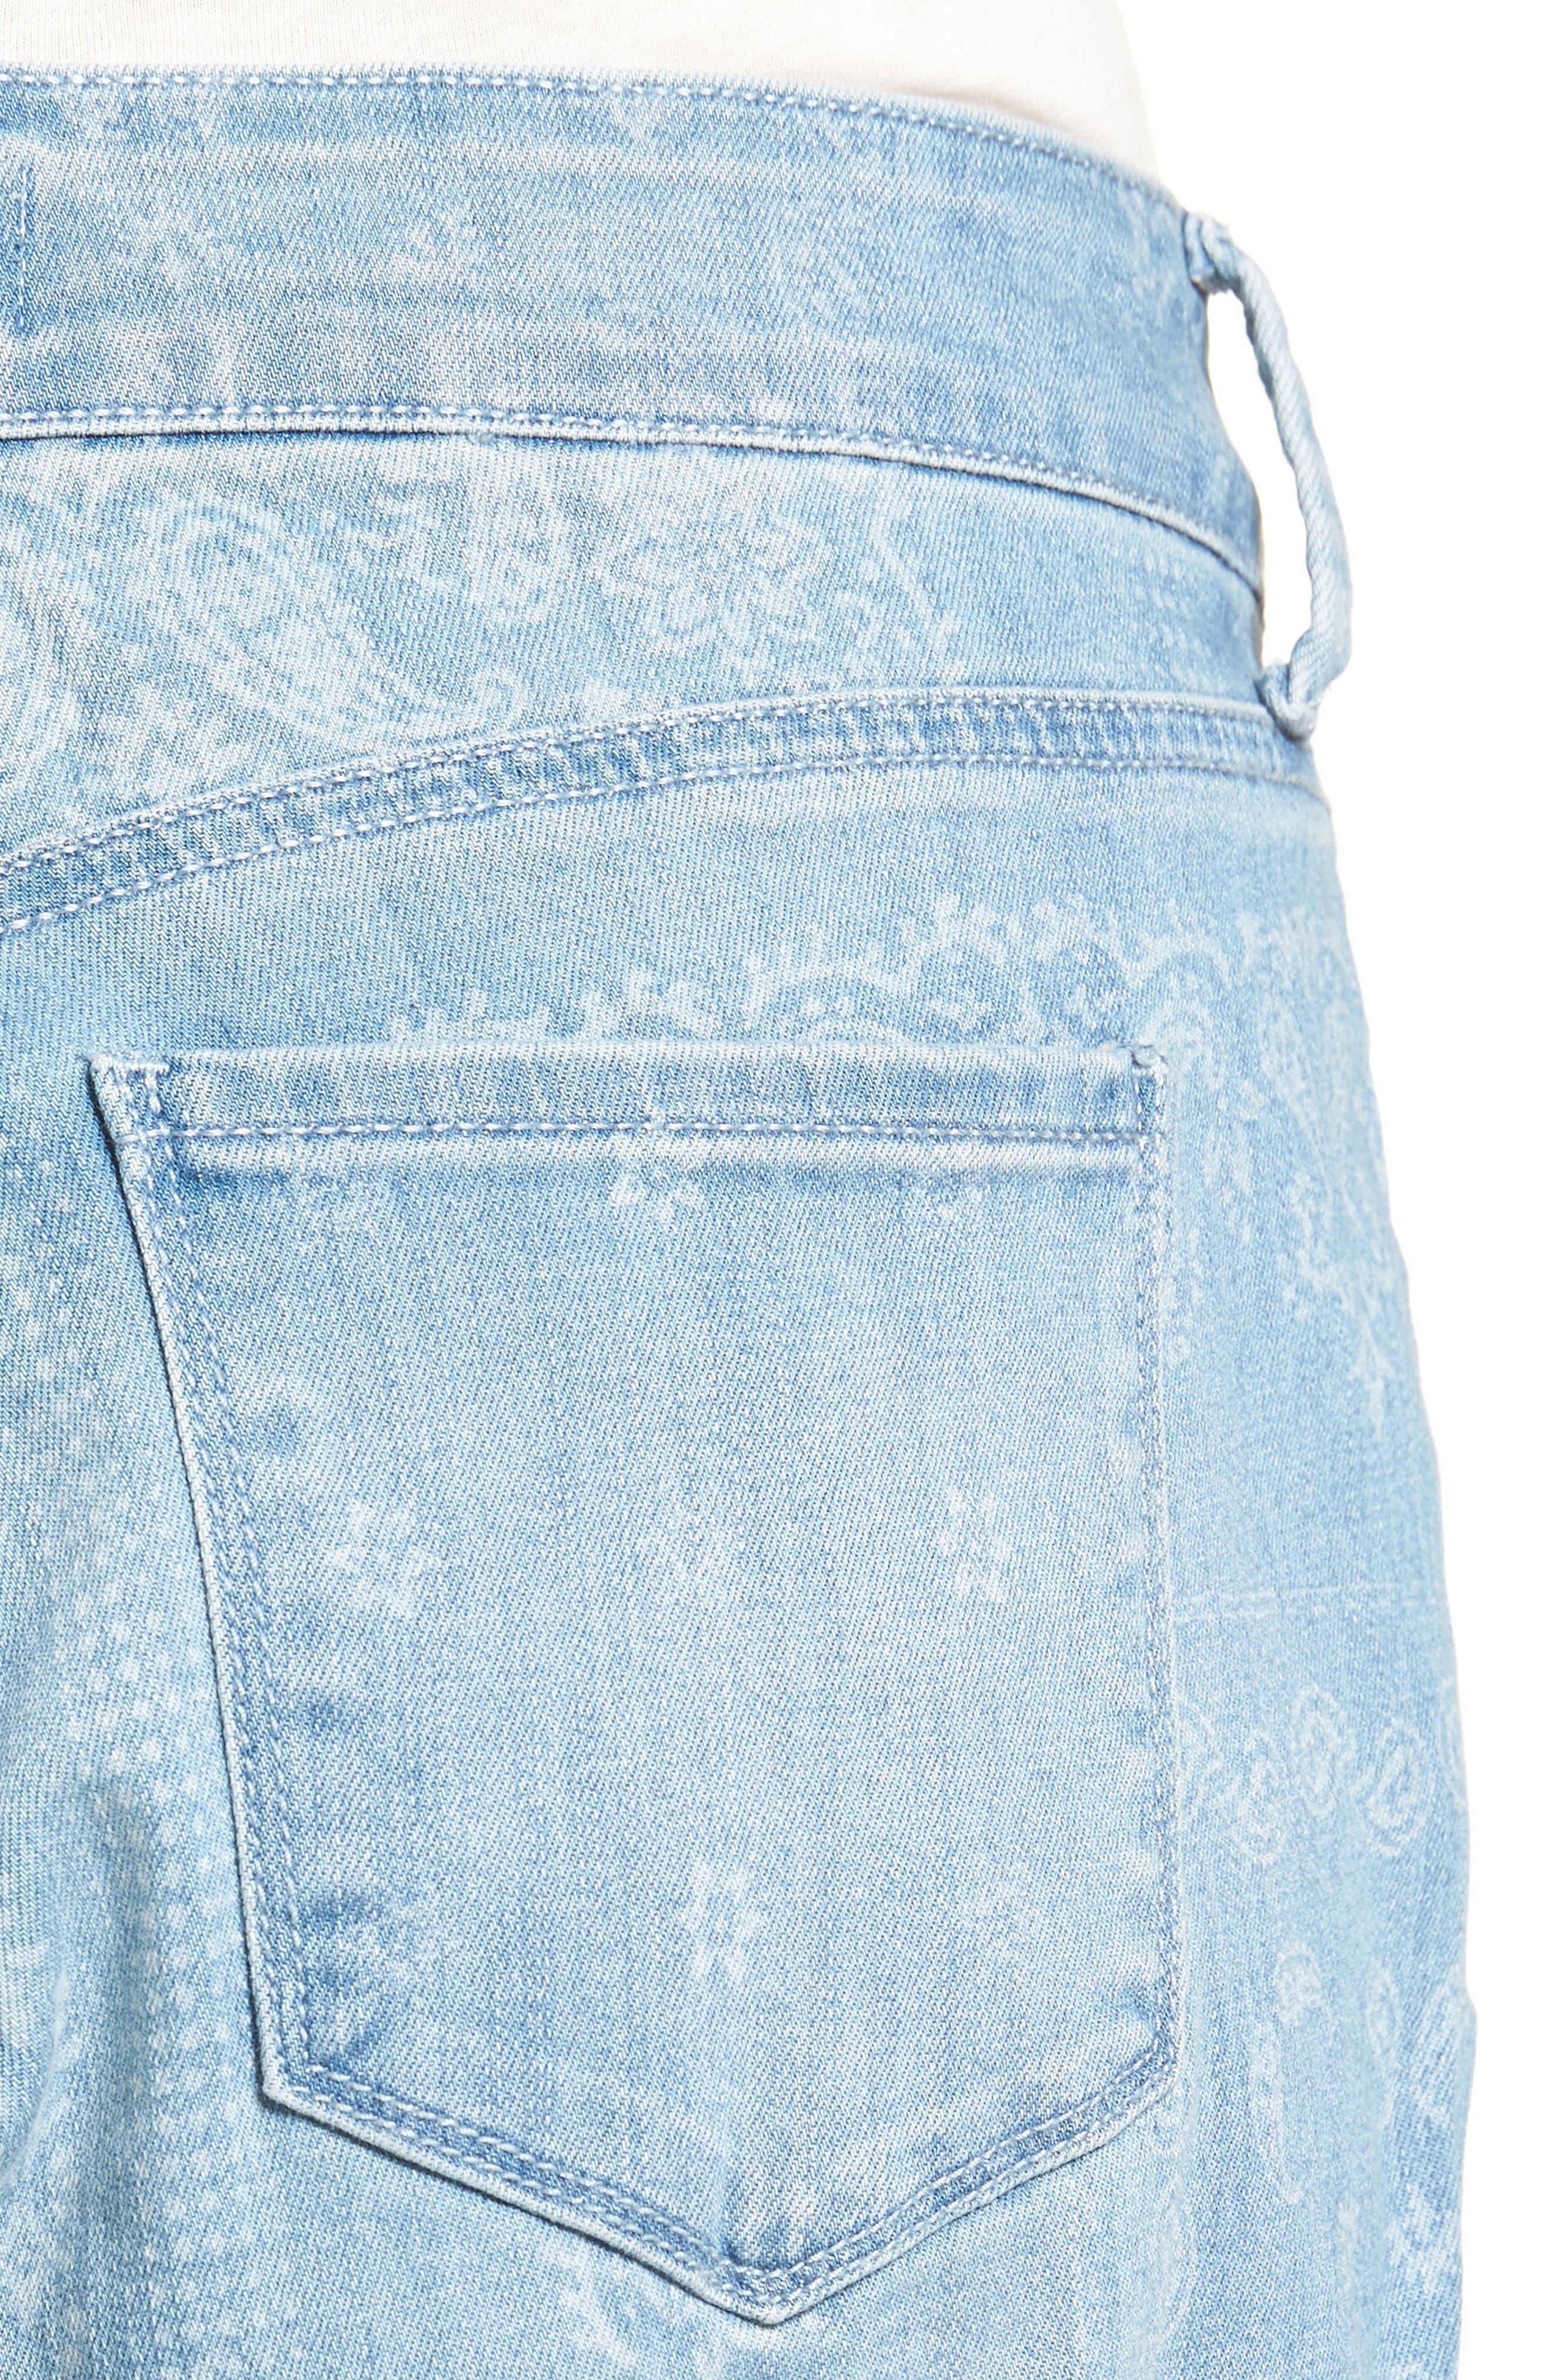 Alternate Image 4  - NYDJ Jessica Print Relaxed Boyfriend Jeans (Bandana) (Regular & Petite)